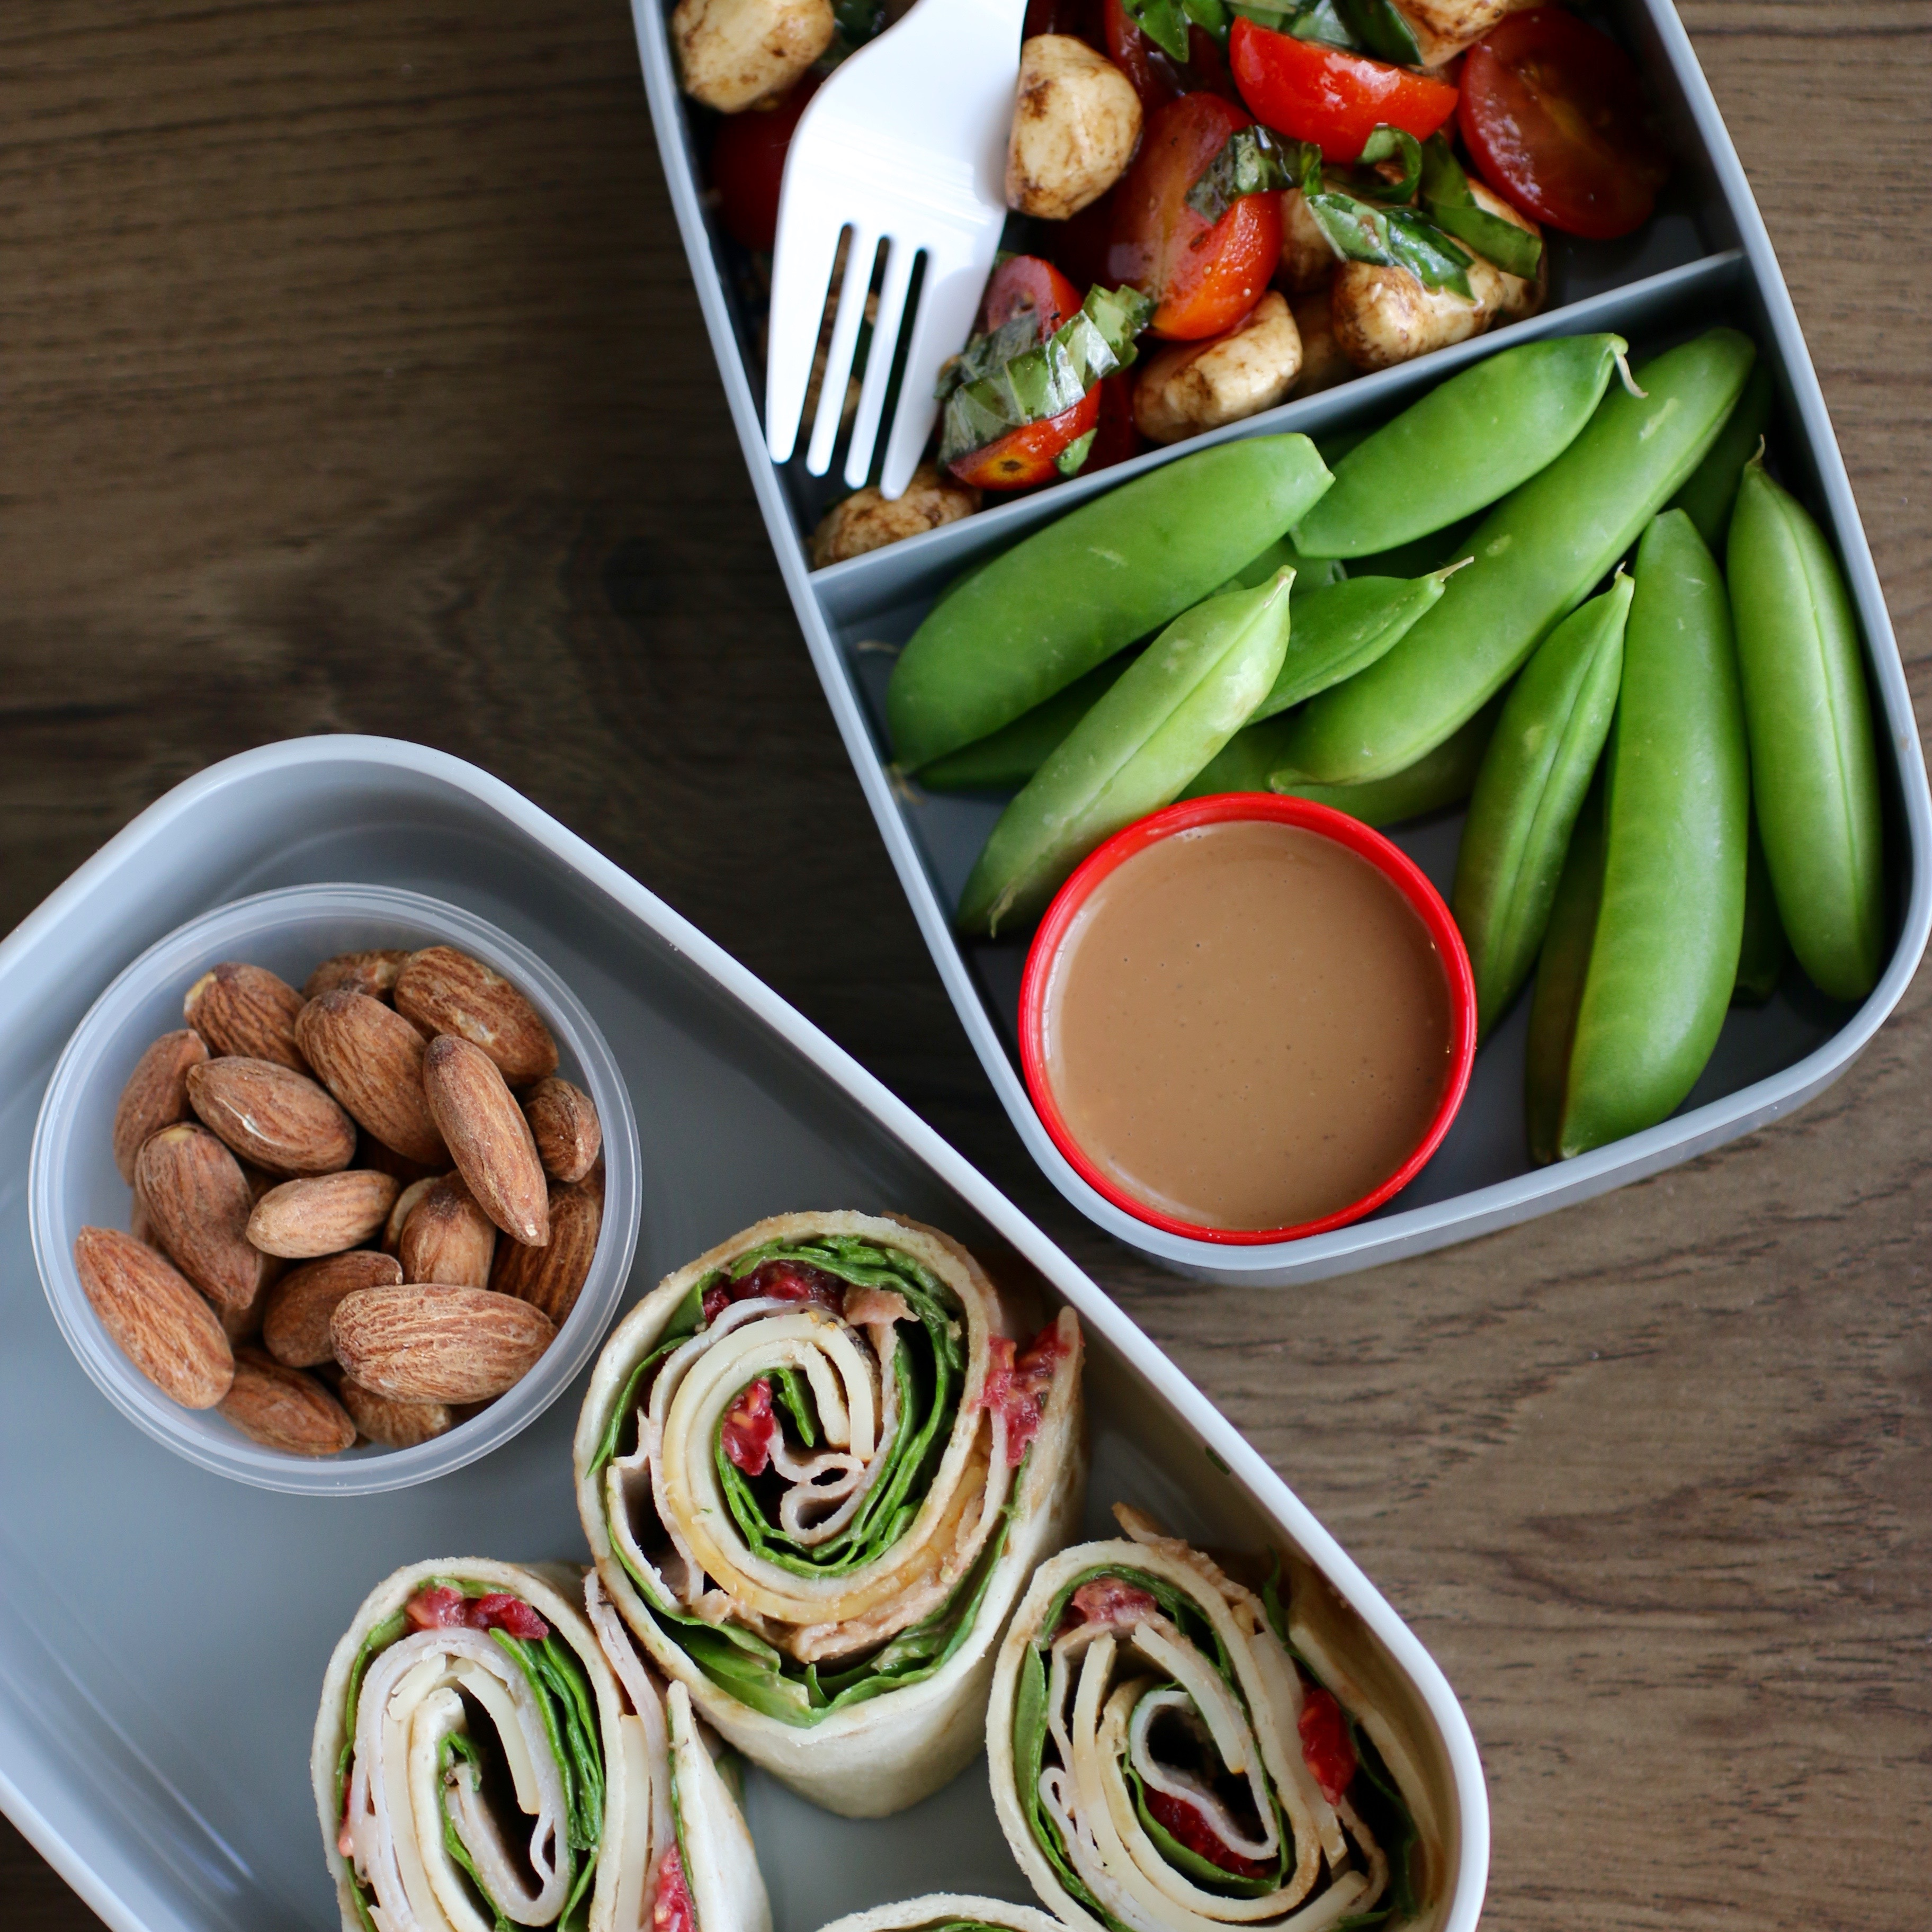 Bento Box Turkey Roll-Ups with Caprese Salad